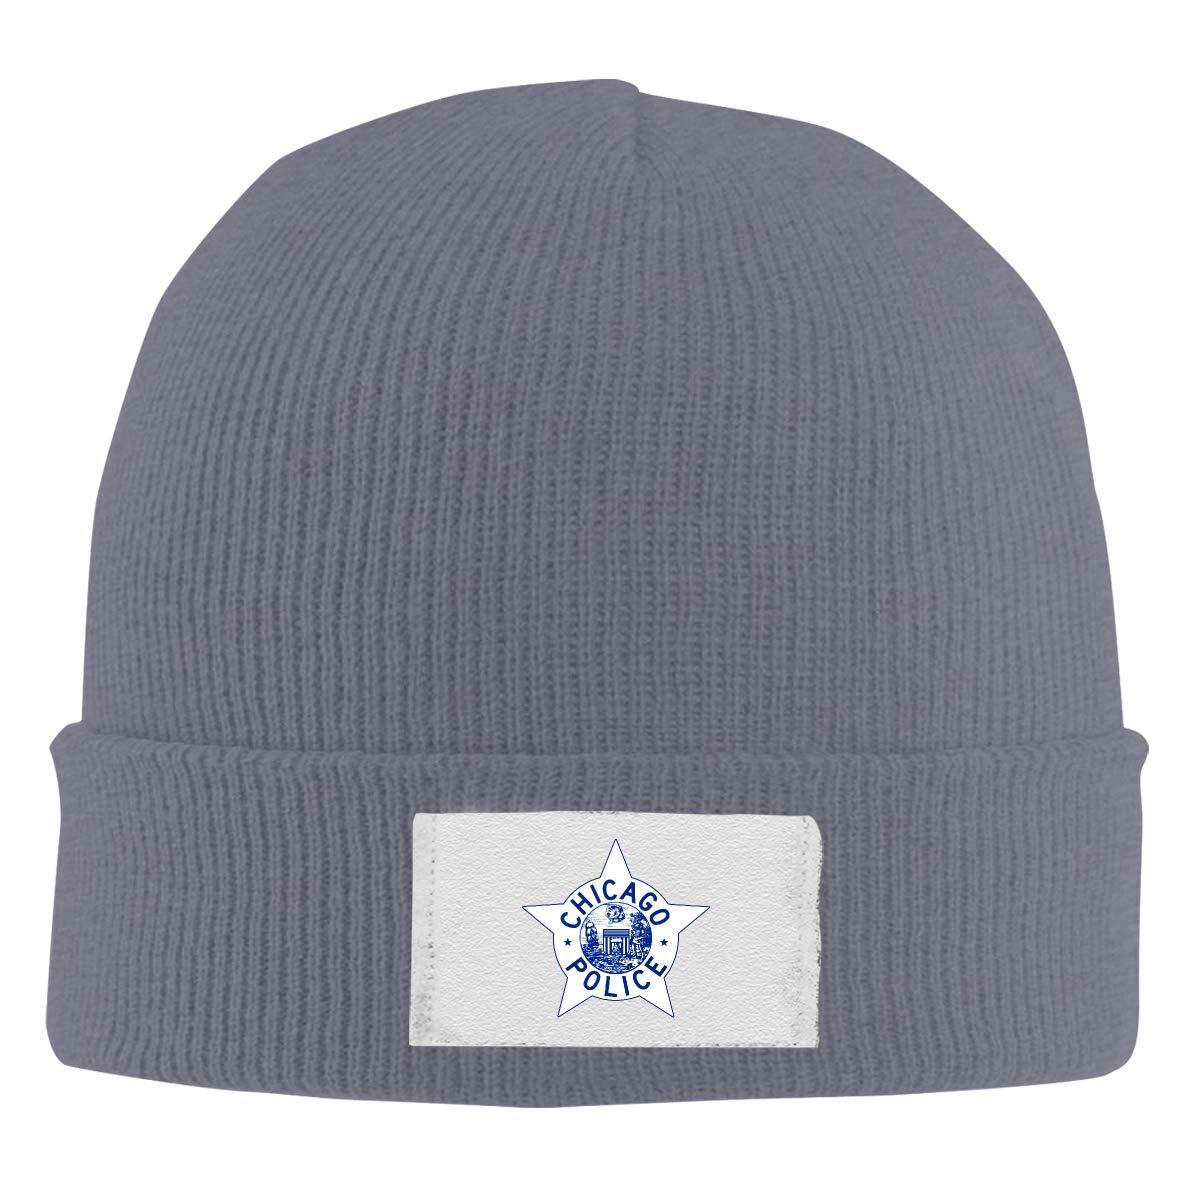 Dunpaiaa Skull Caps Chicago Police Logo Winter Warm Knit Hats Stretchy Cuff Beanie Hat Black